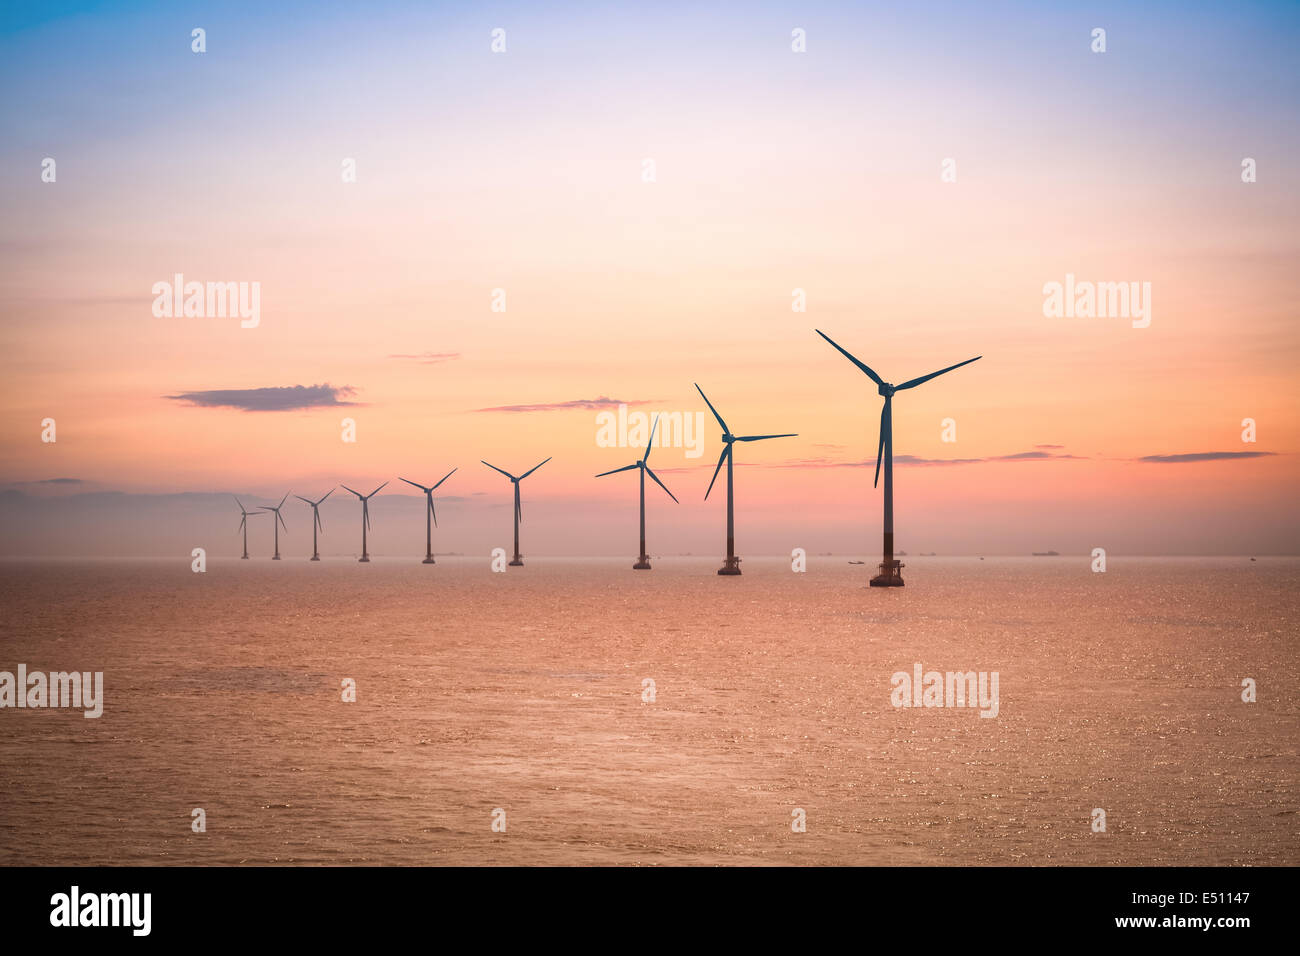 Offshore-Windpark in der Abenddämmerung Stockbild